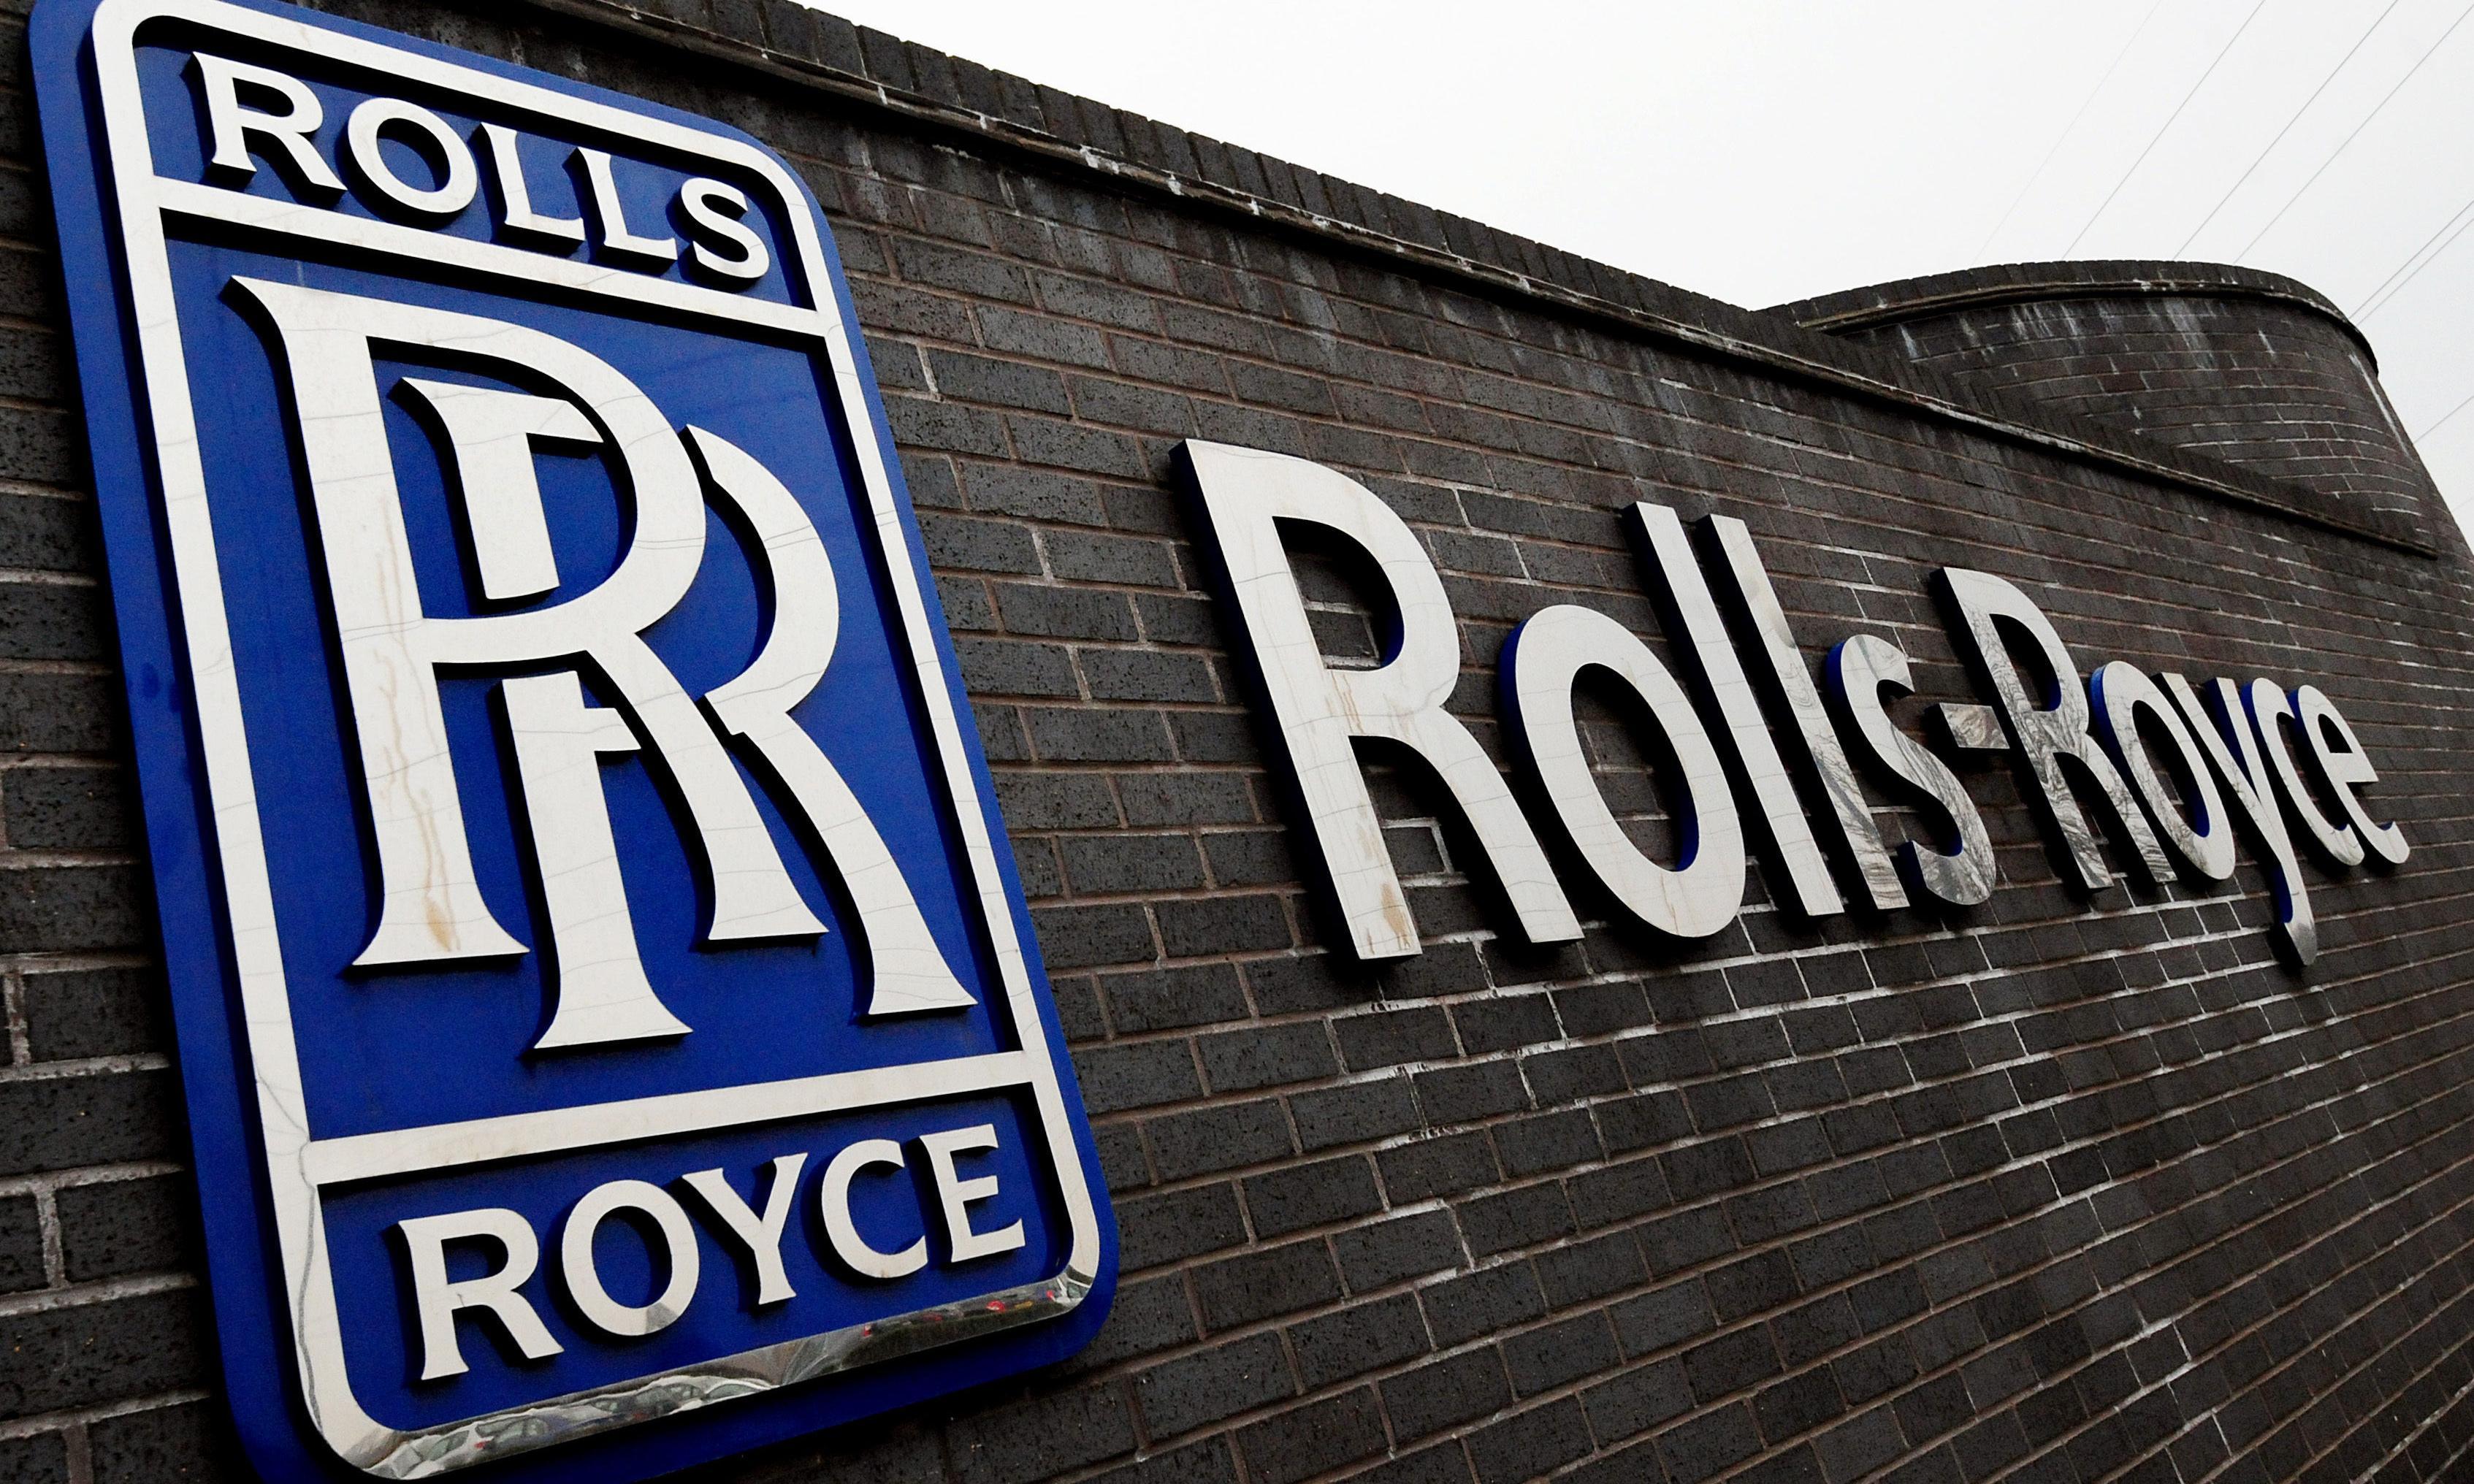 Campaigners condemn closure of Rolls-Royce bribery inquiry